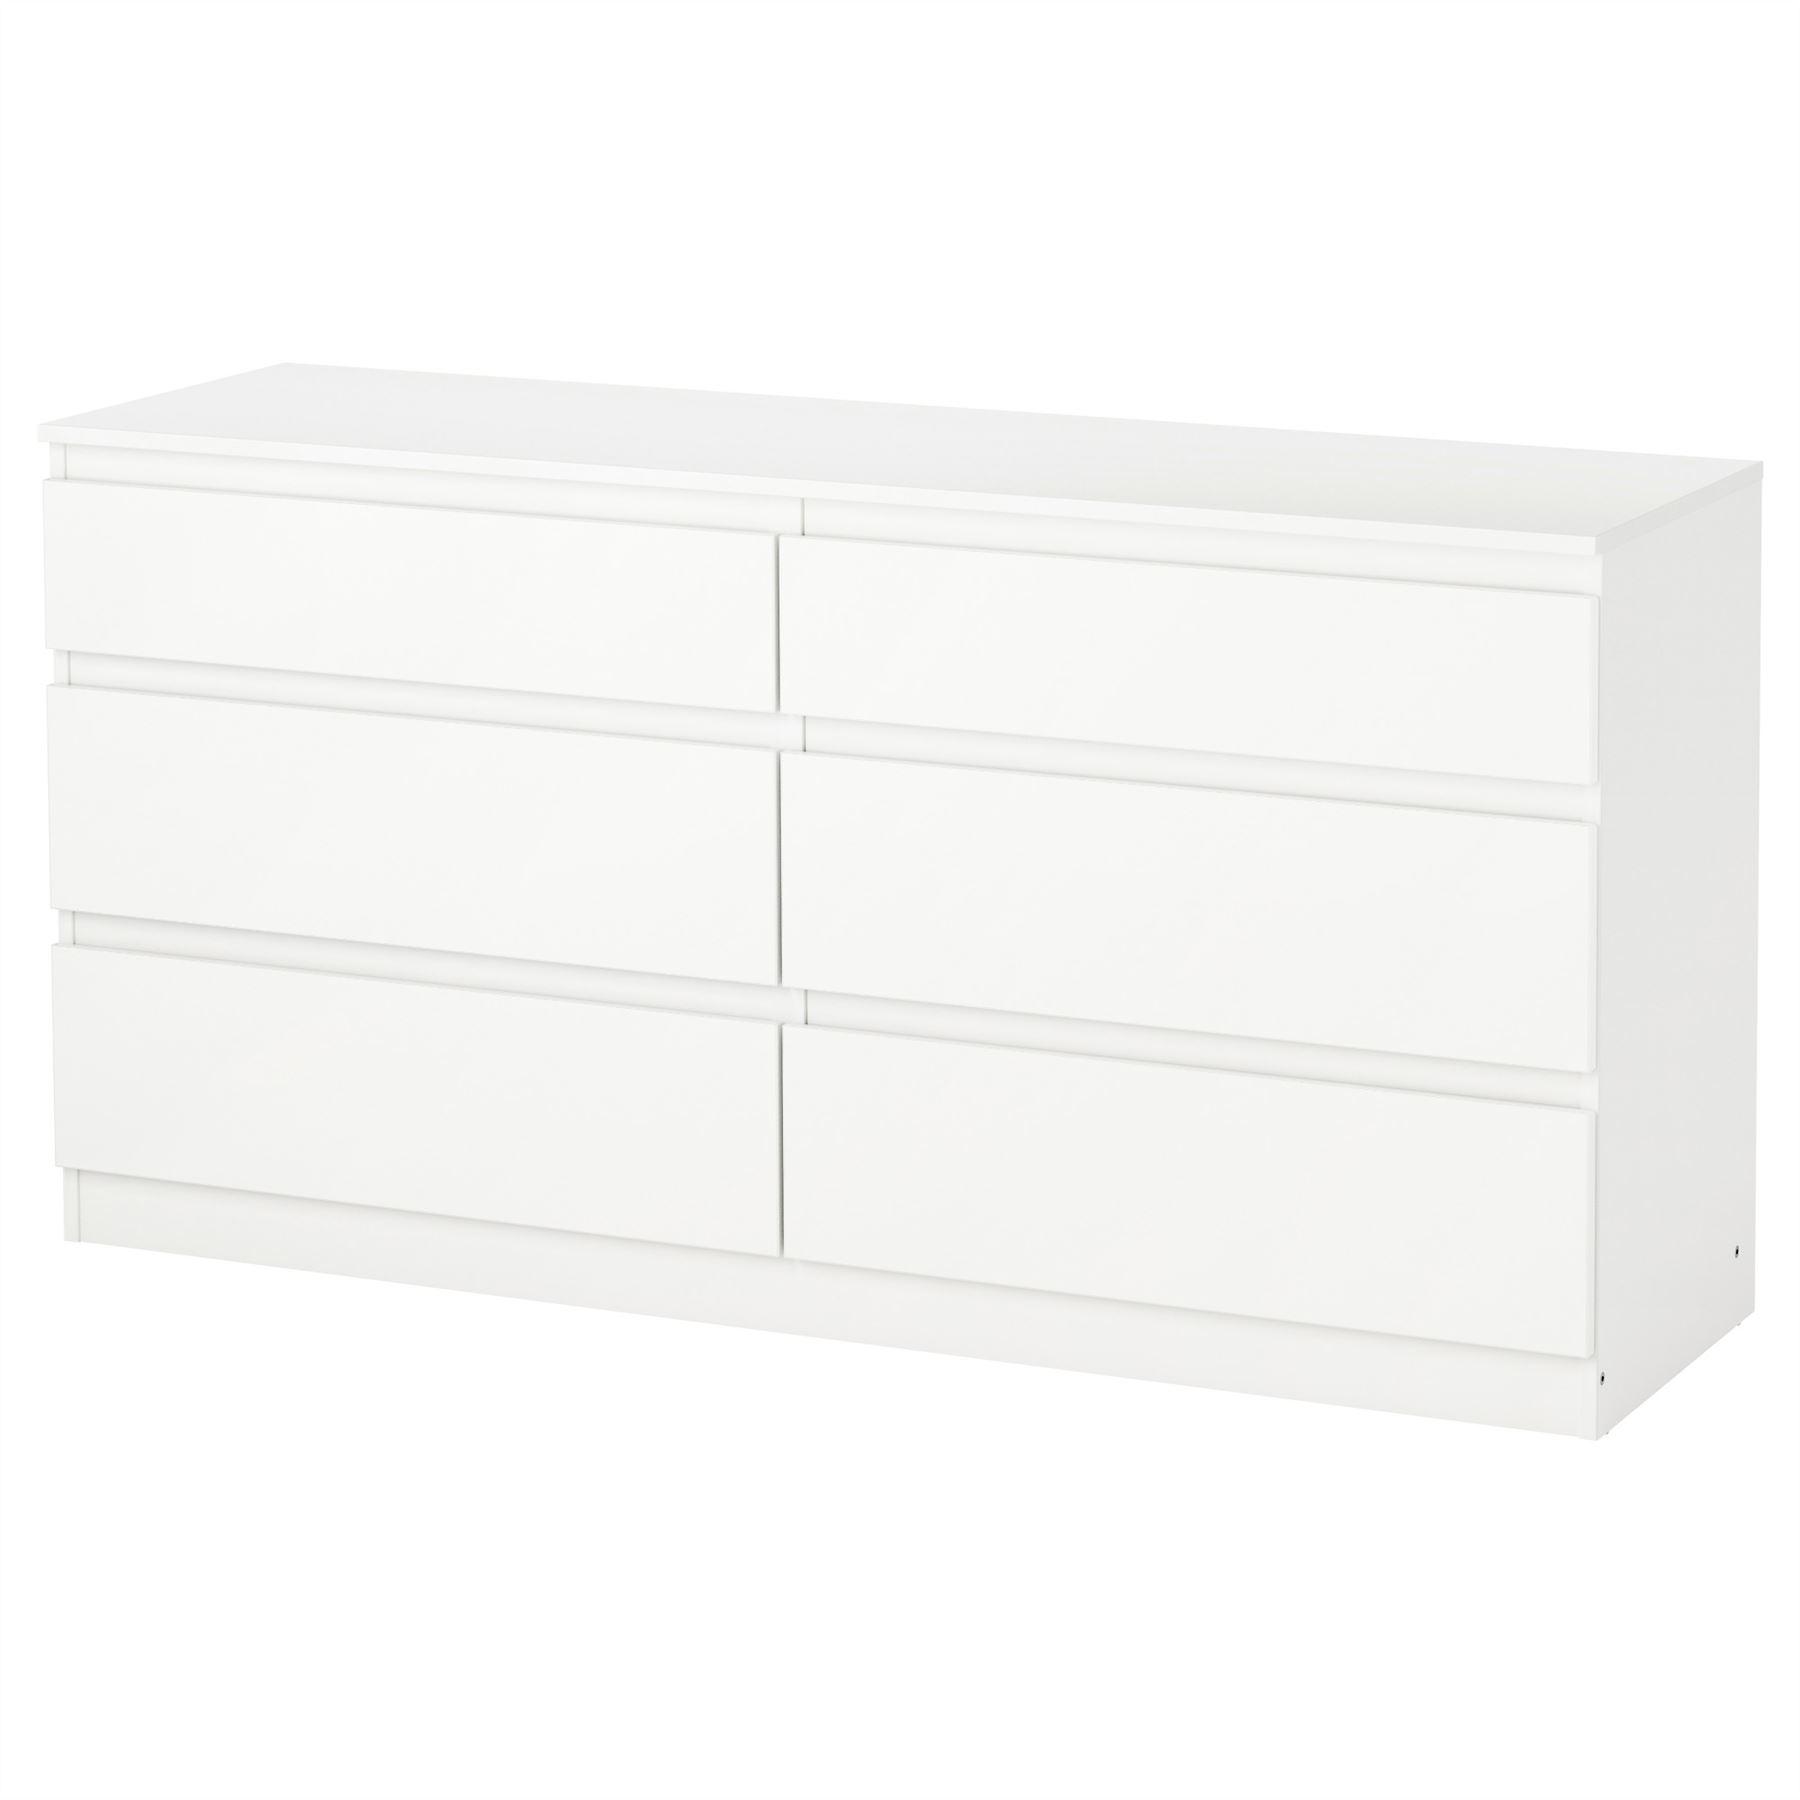 Oak Effect Bedroom Furniture Sets White And Oak Effect Bedroom Furniture Best Bedroom Ideas 2017